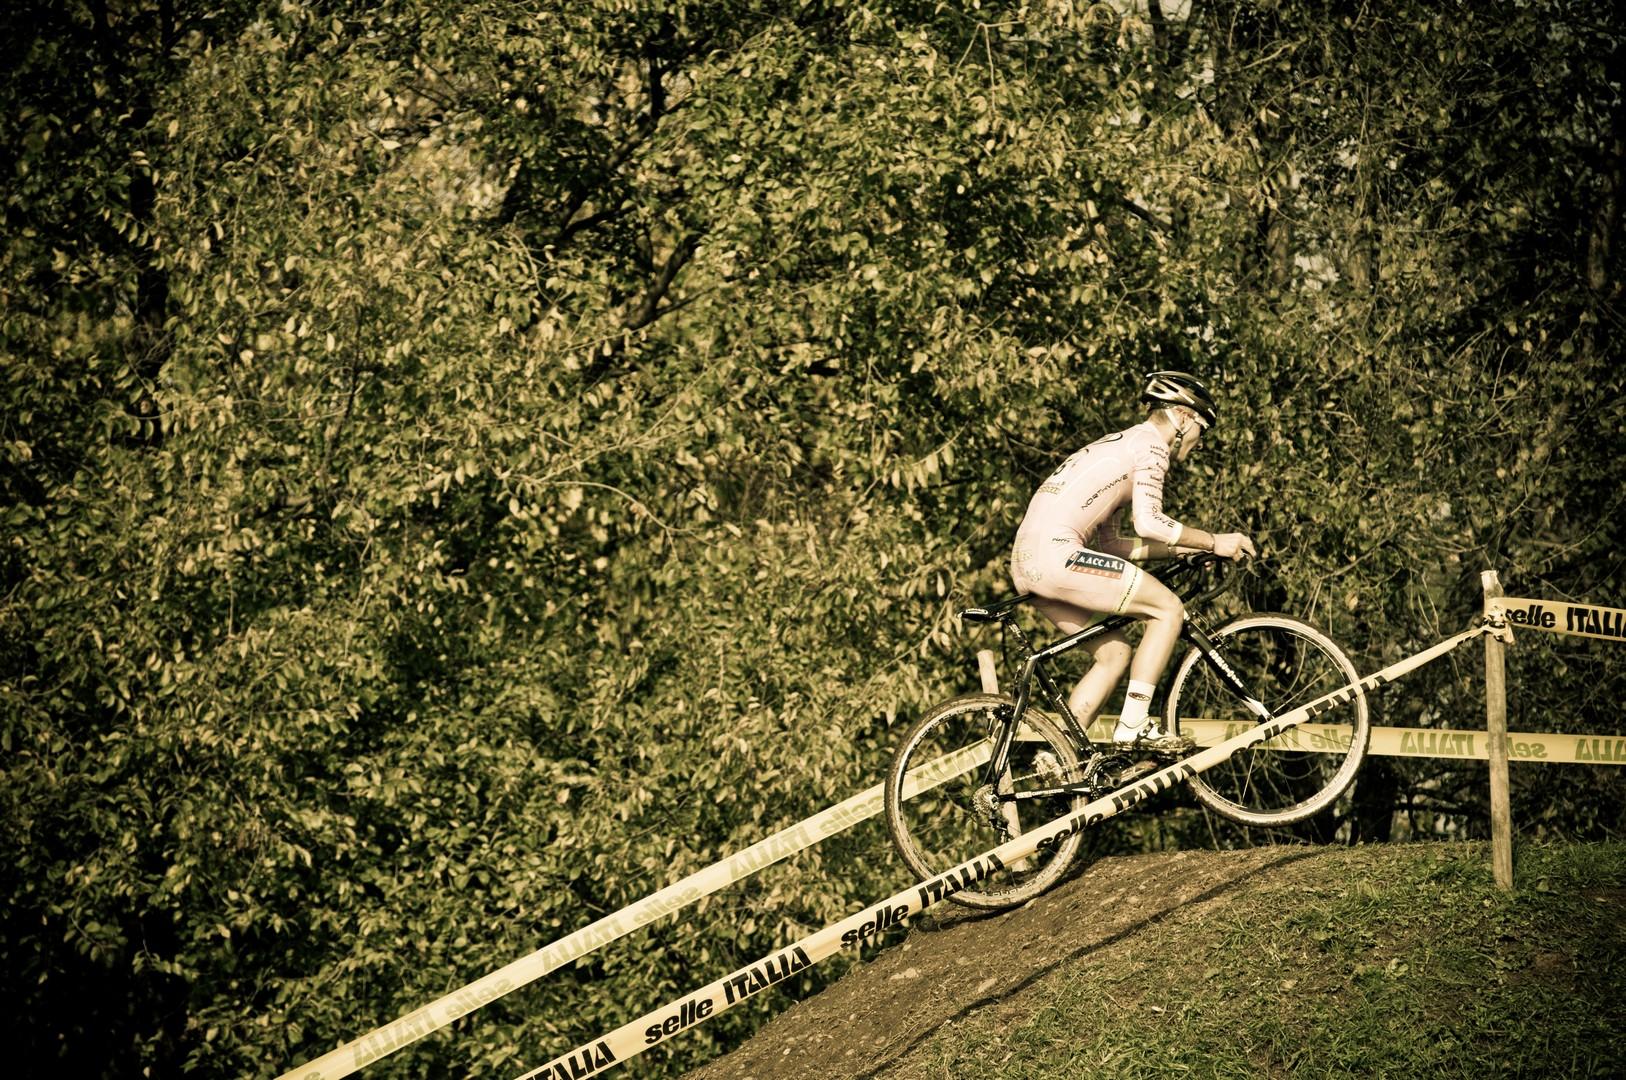 Giro d'Italia Ciclocross 2013